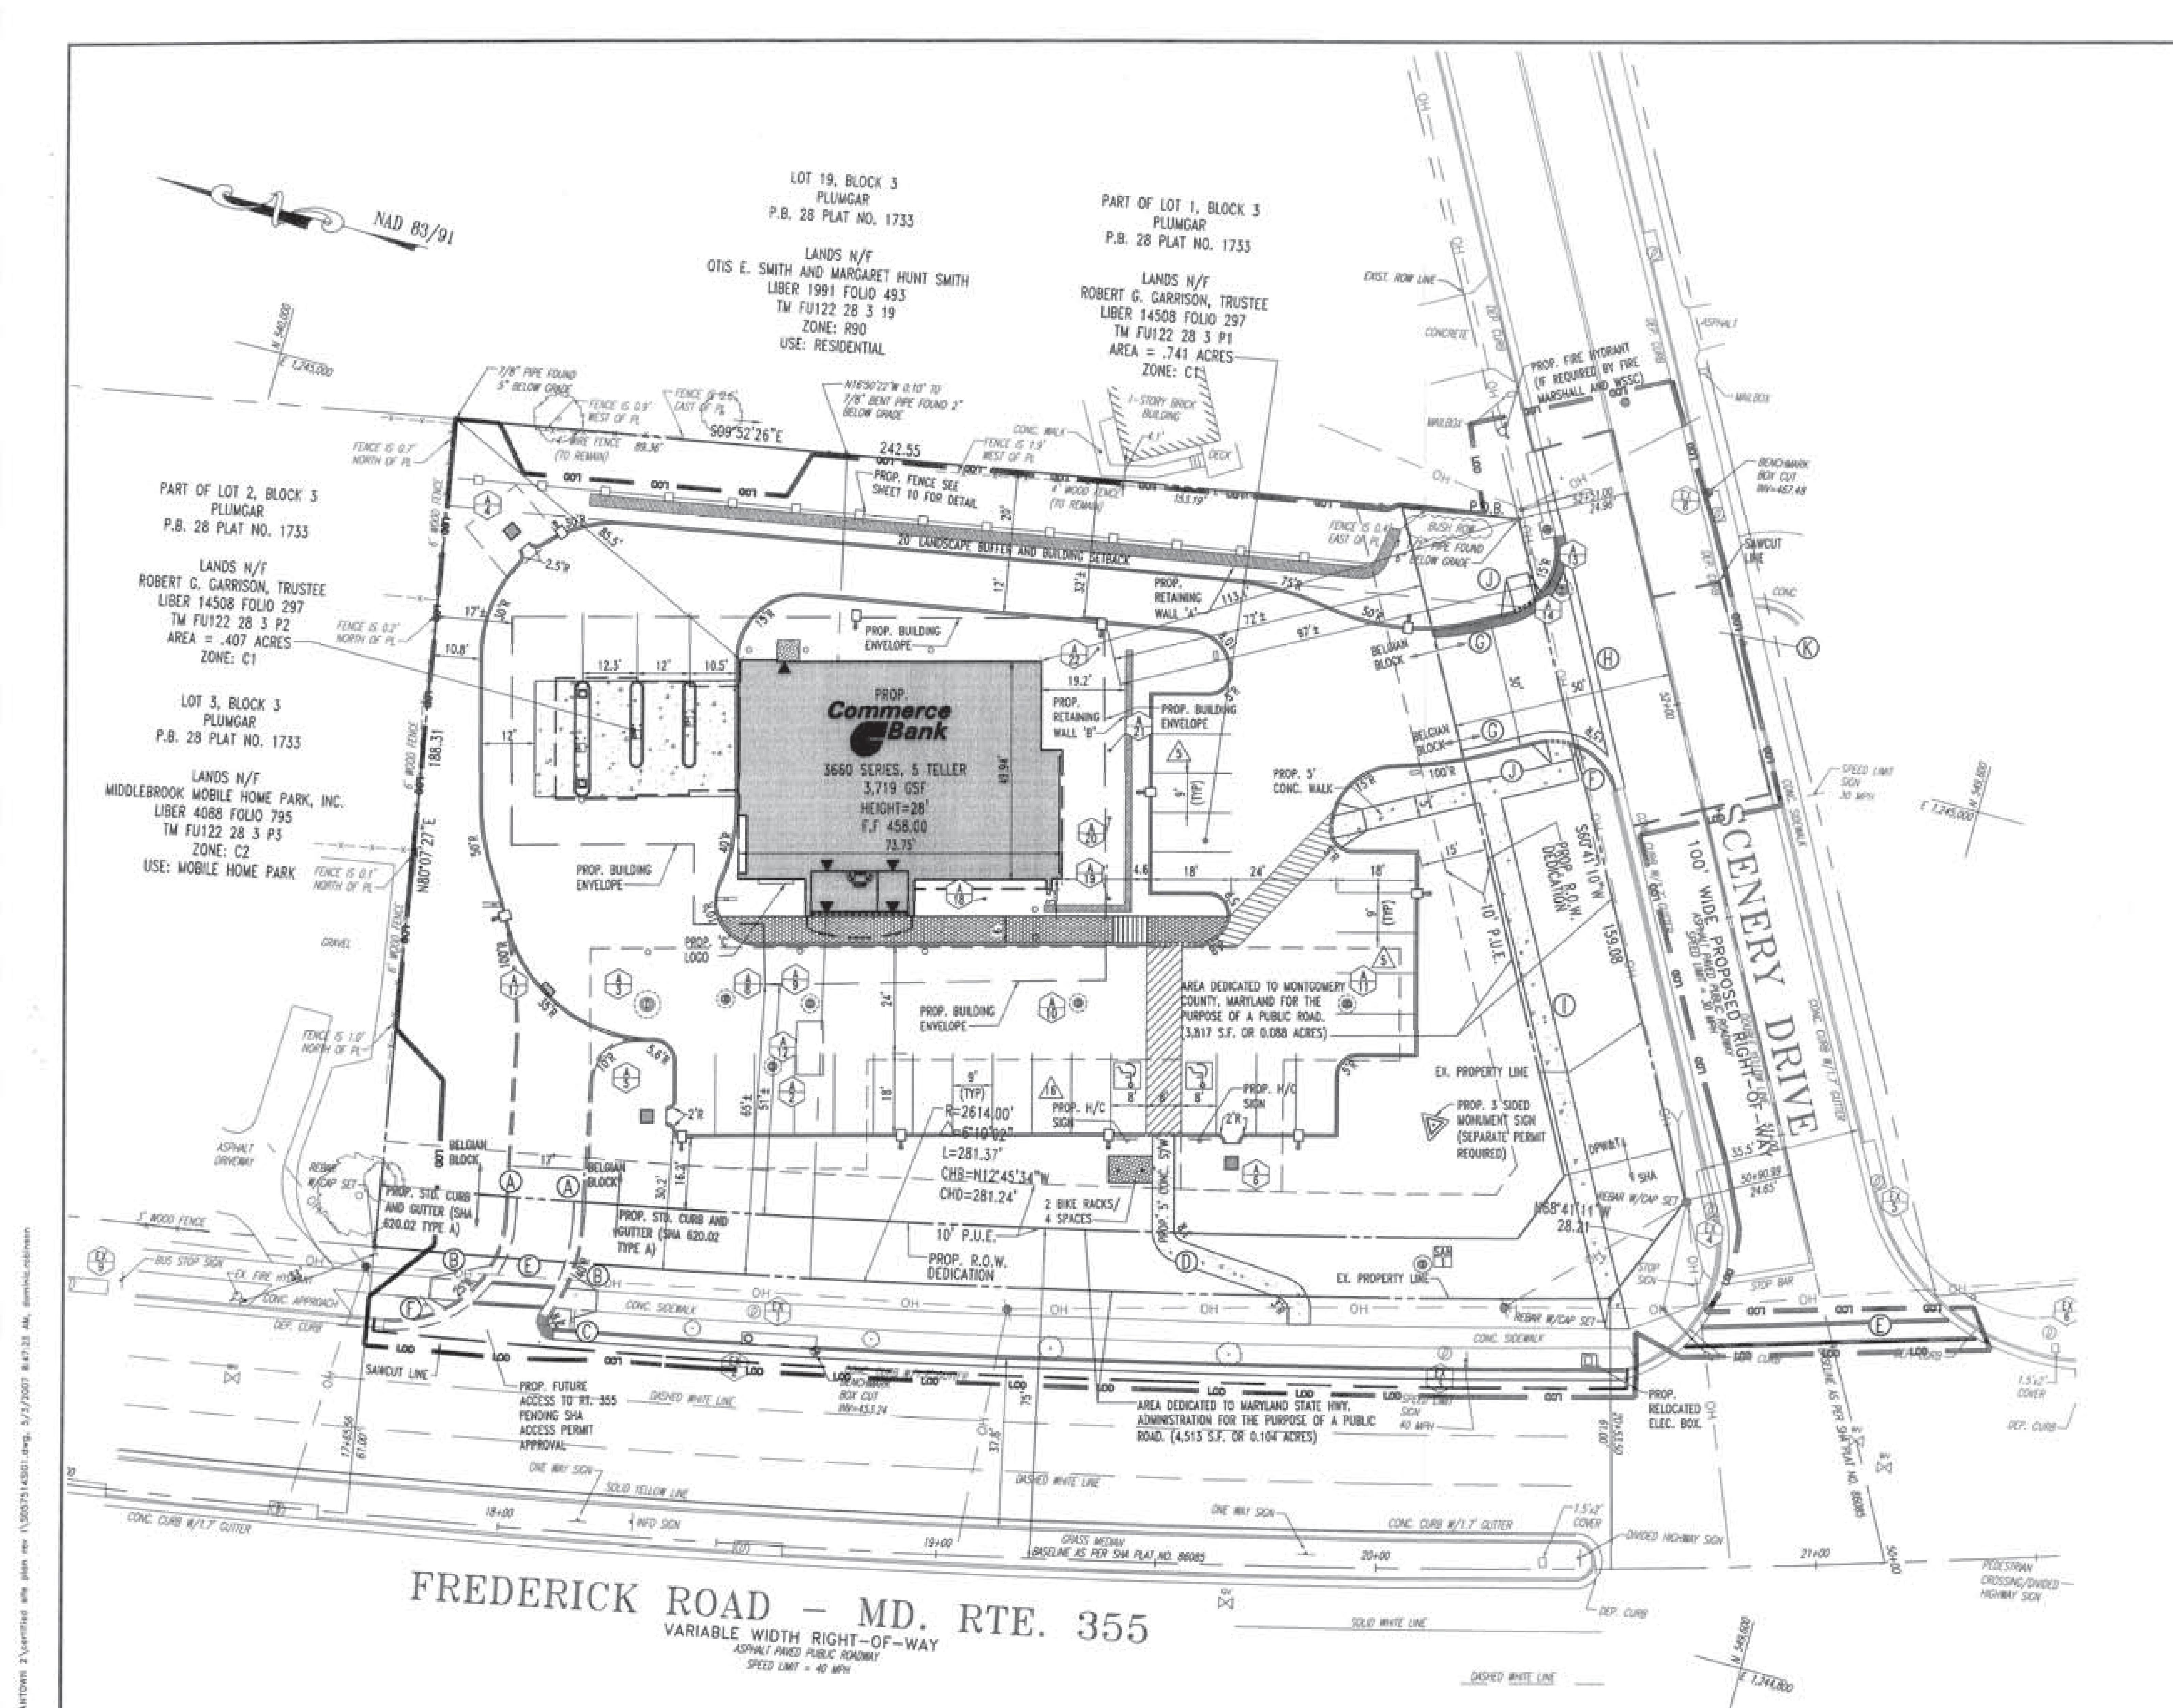 19501 N Frederick Rd: site plan